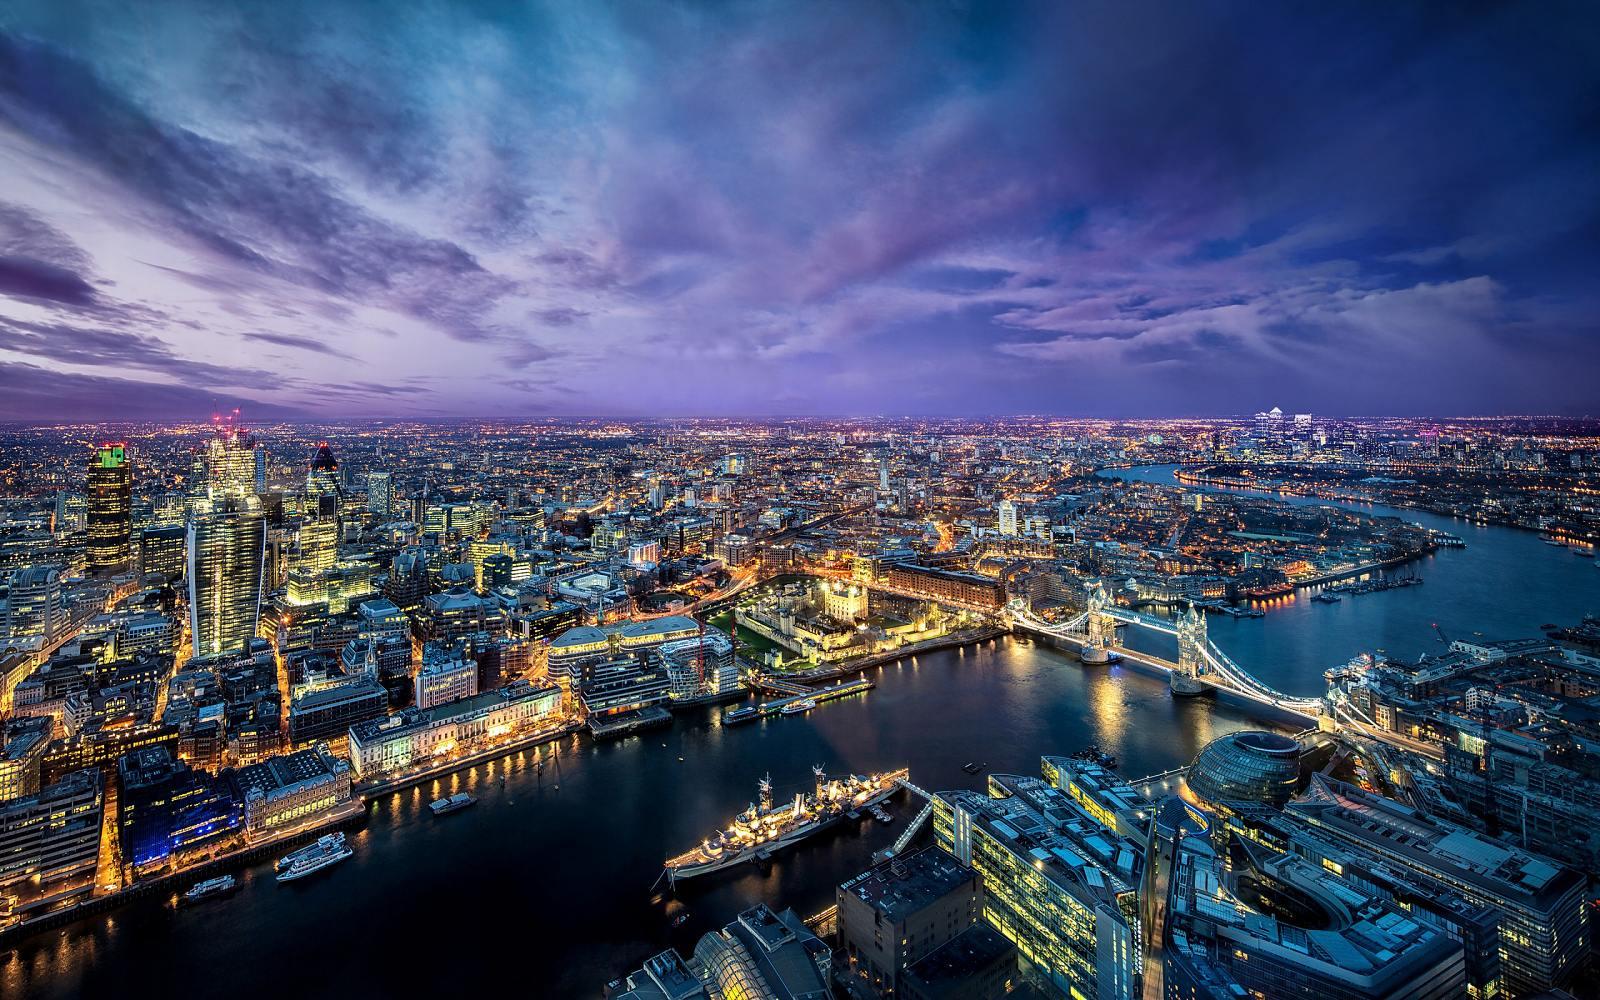 019 - London - England